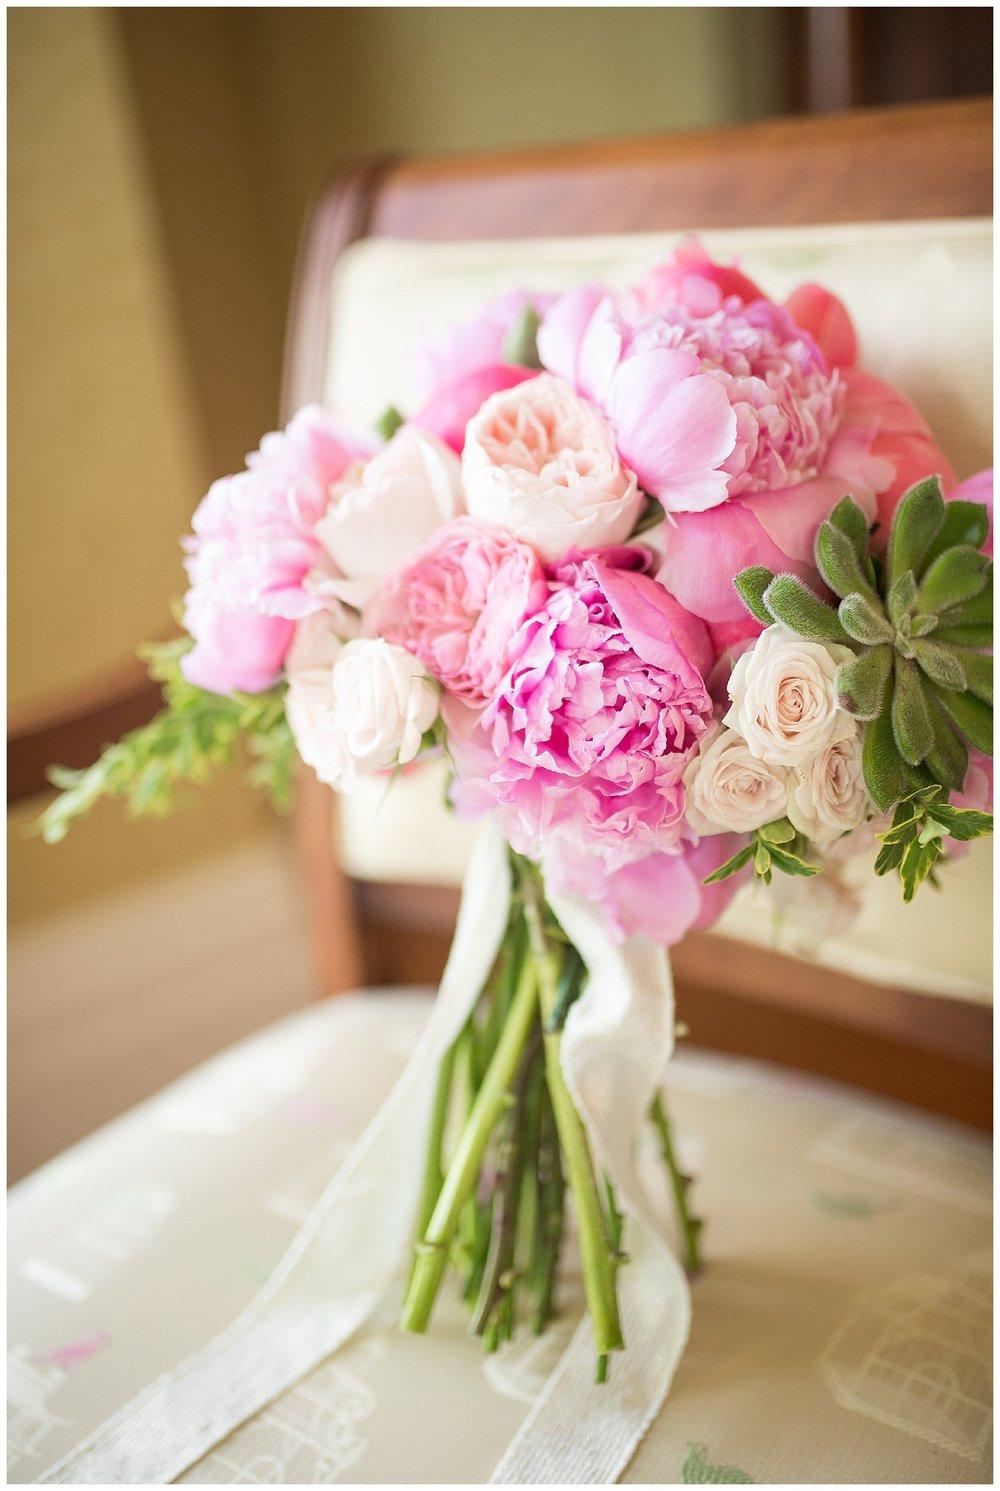 everleigh-photography-cincinnati-wedding-photographer-best-moments-of-2016-cincinnati-wedding-cincinnati-weddings-97